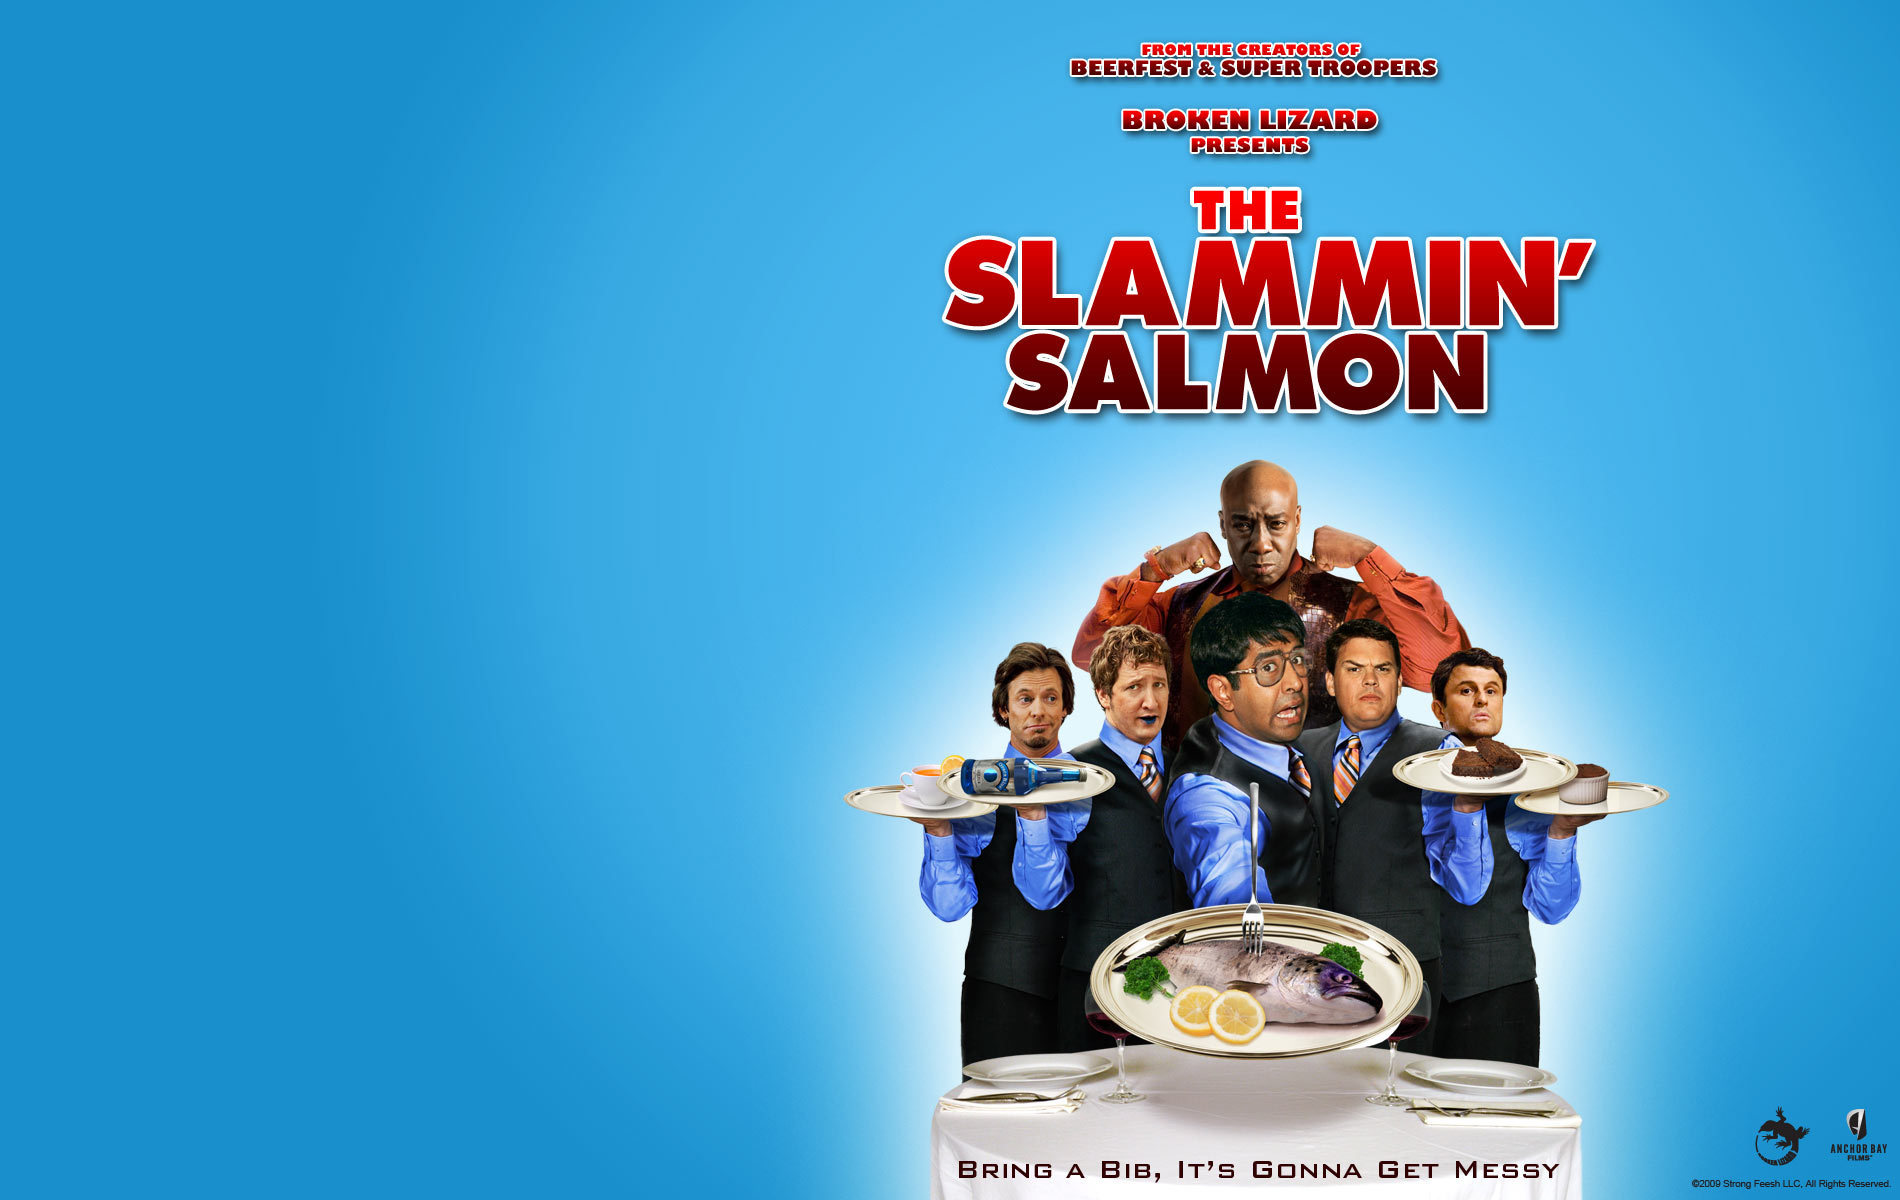 The Slammin' Salmon - Broken Lizard Photo (9041242) - Fanpop